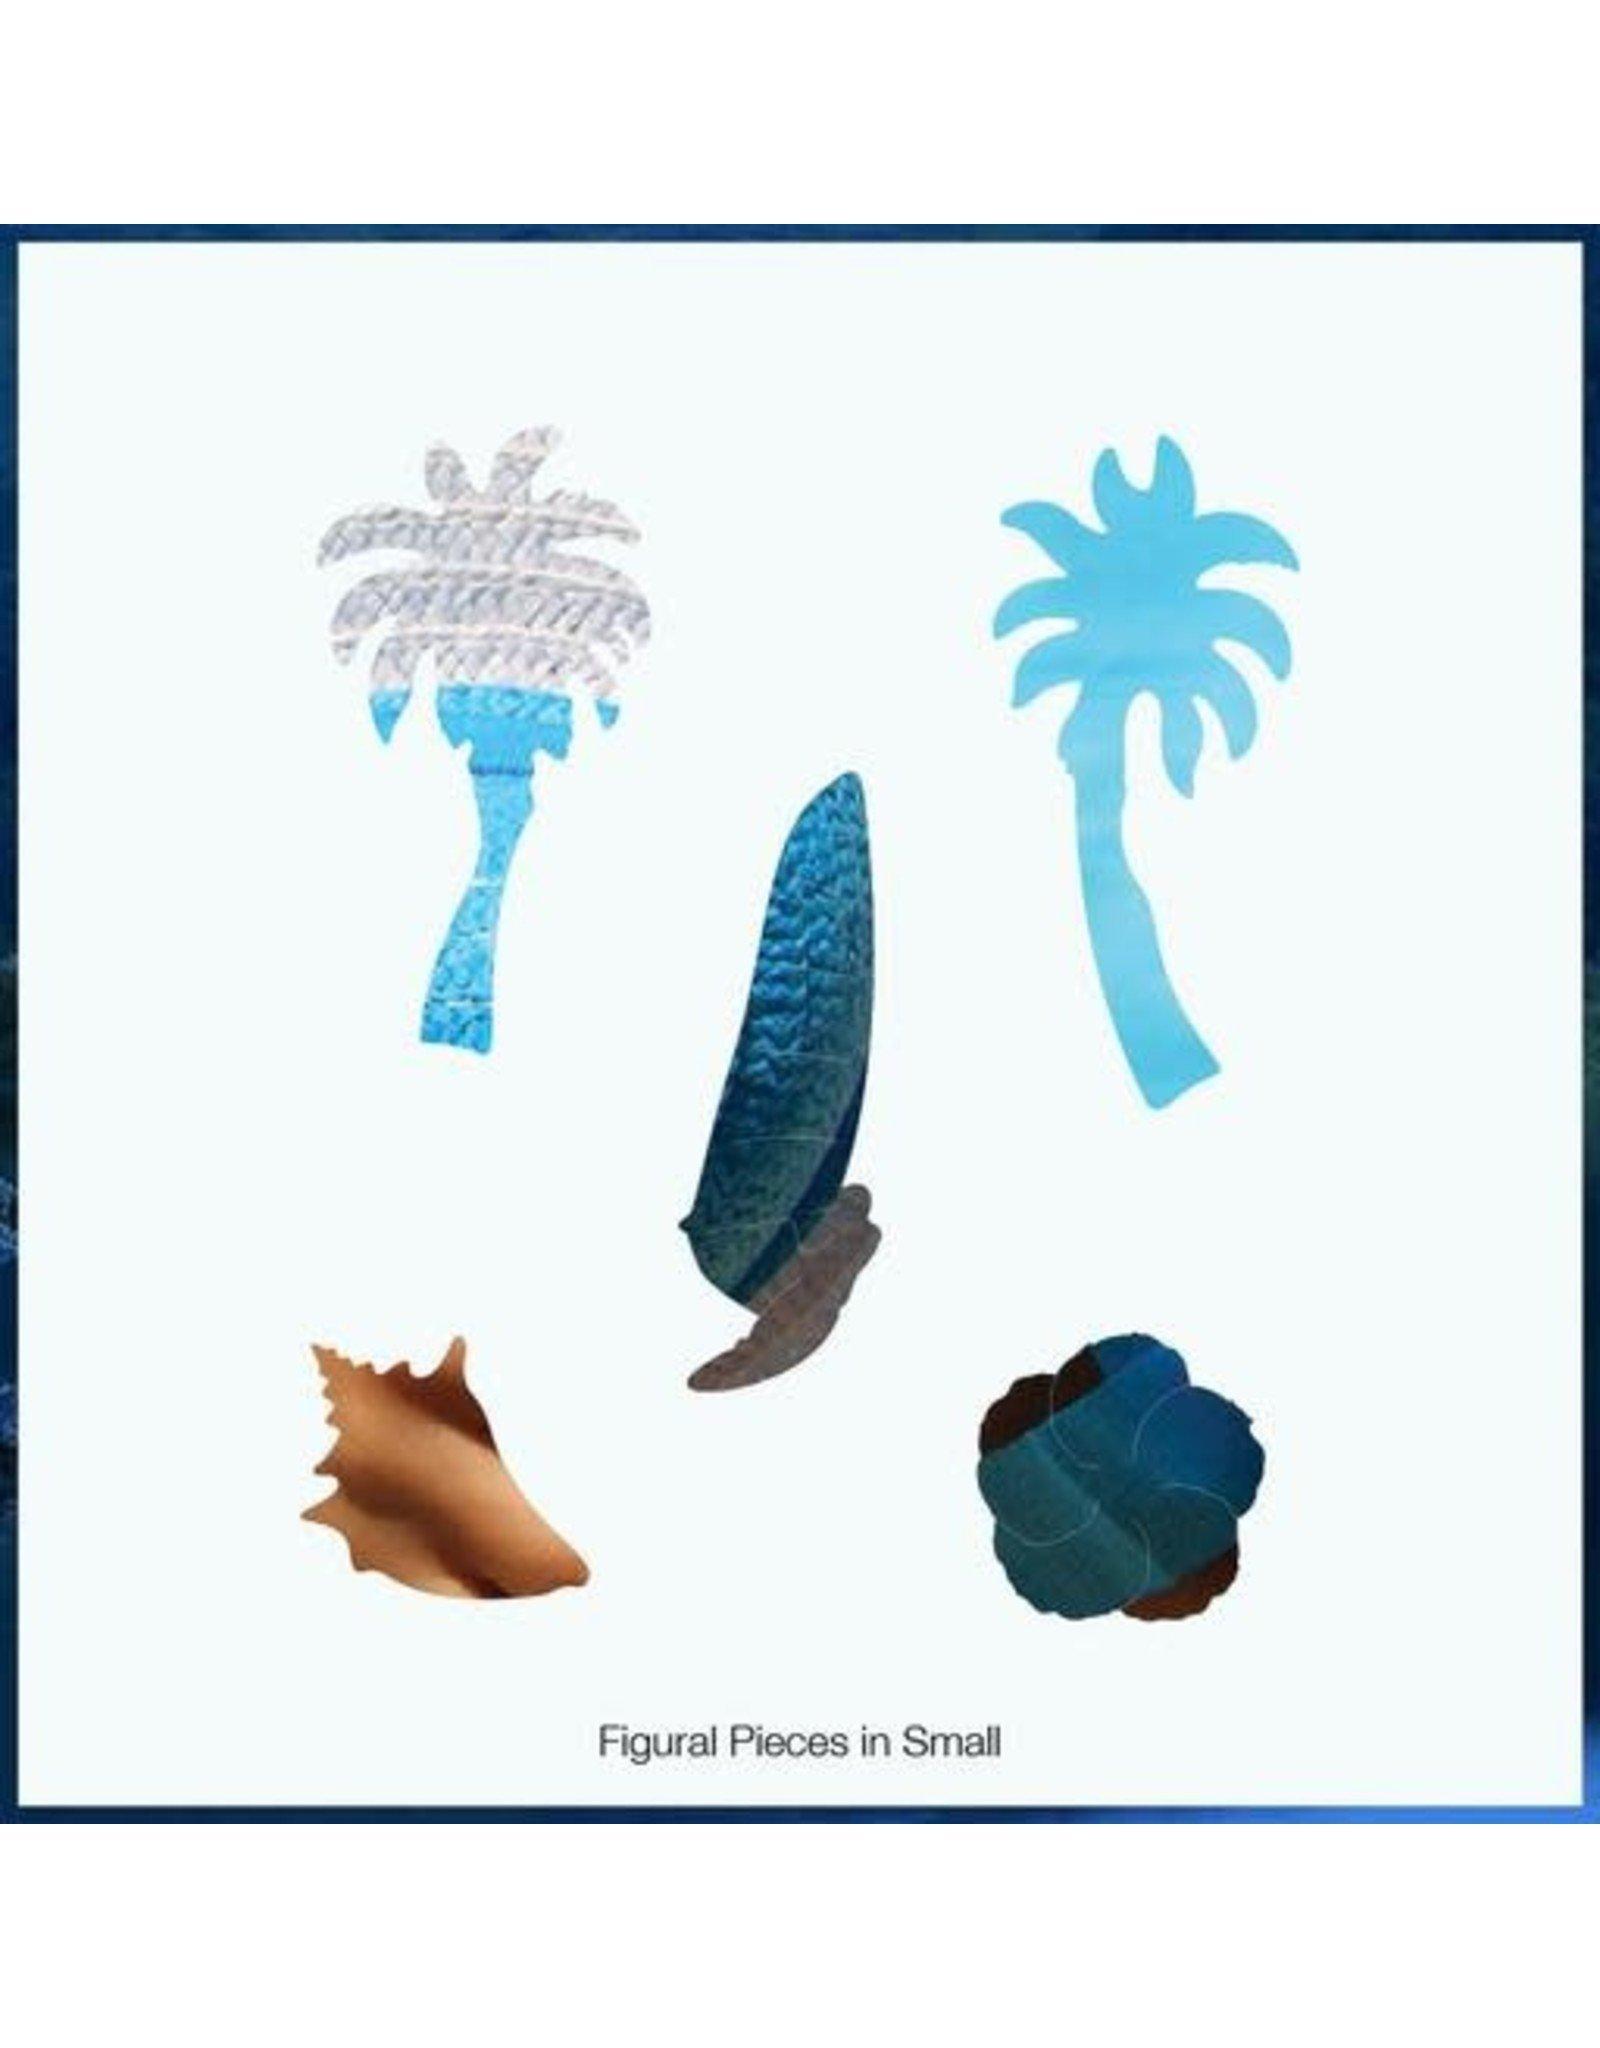 Zen Art & Design Blue Hat (Sm, 126 Pieces, Artisanal Wooden Jigsaw Puzzle)